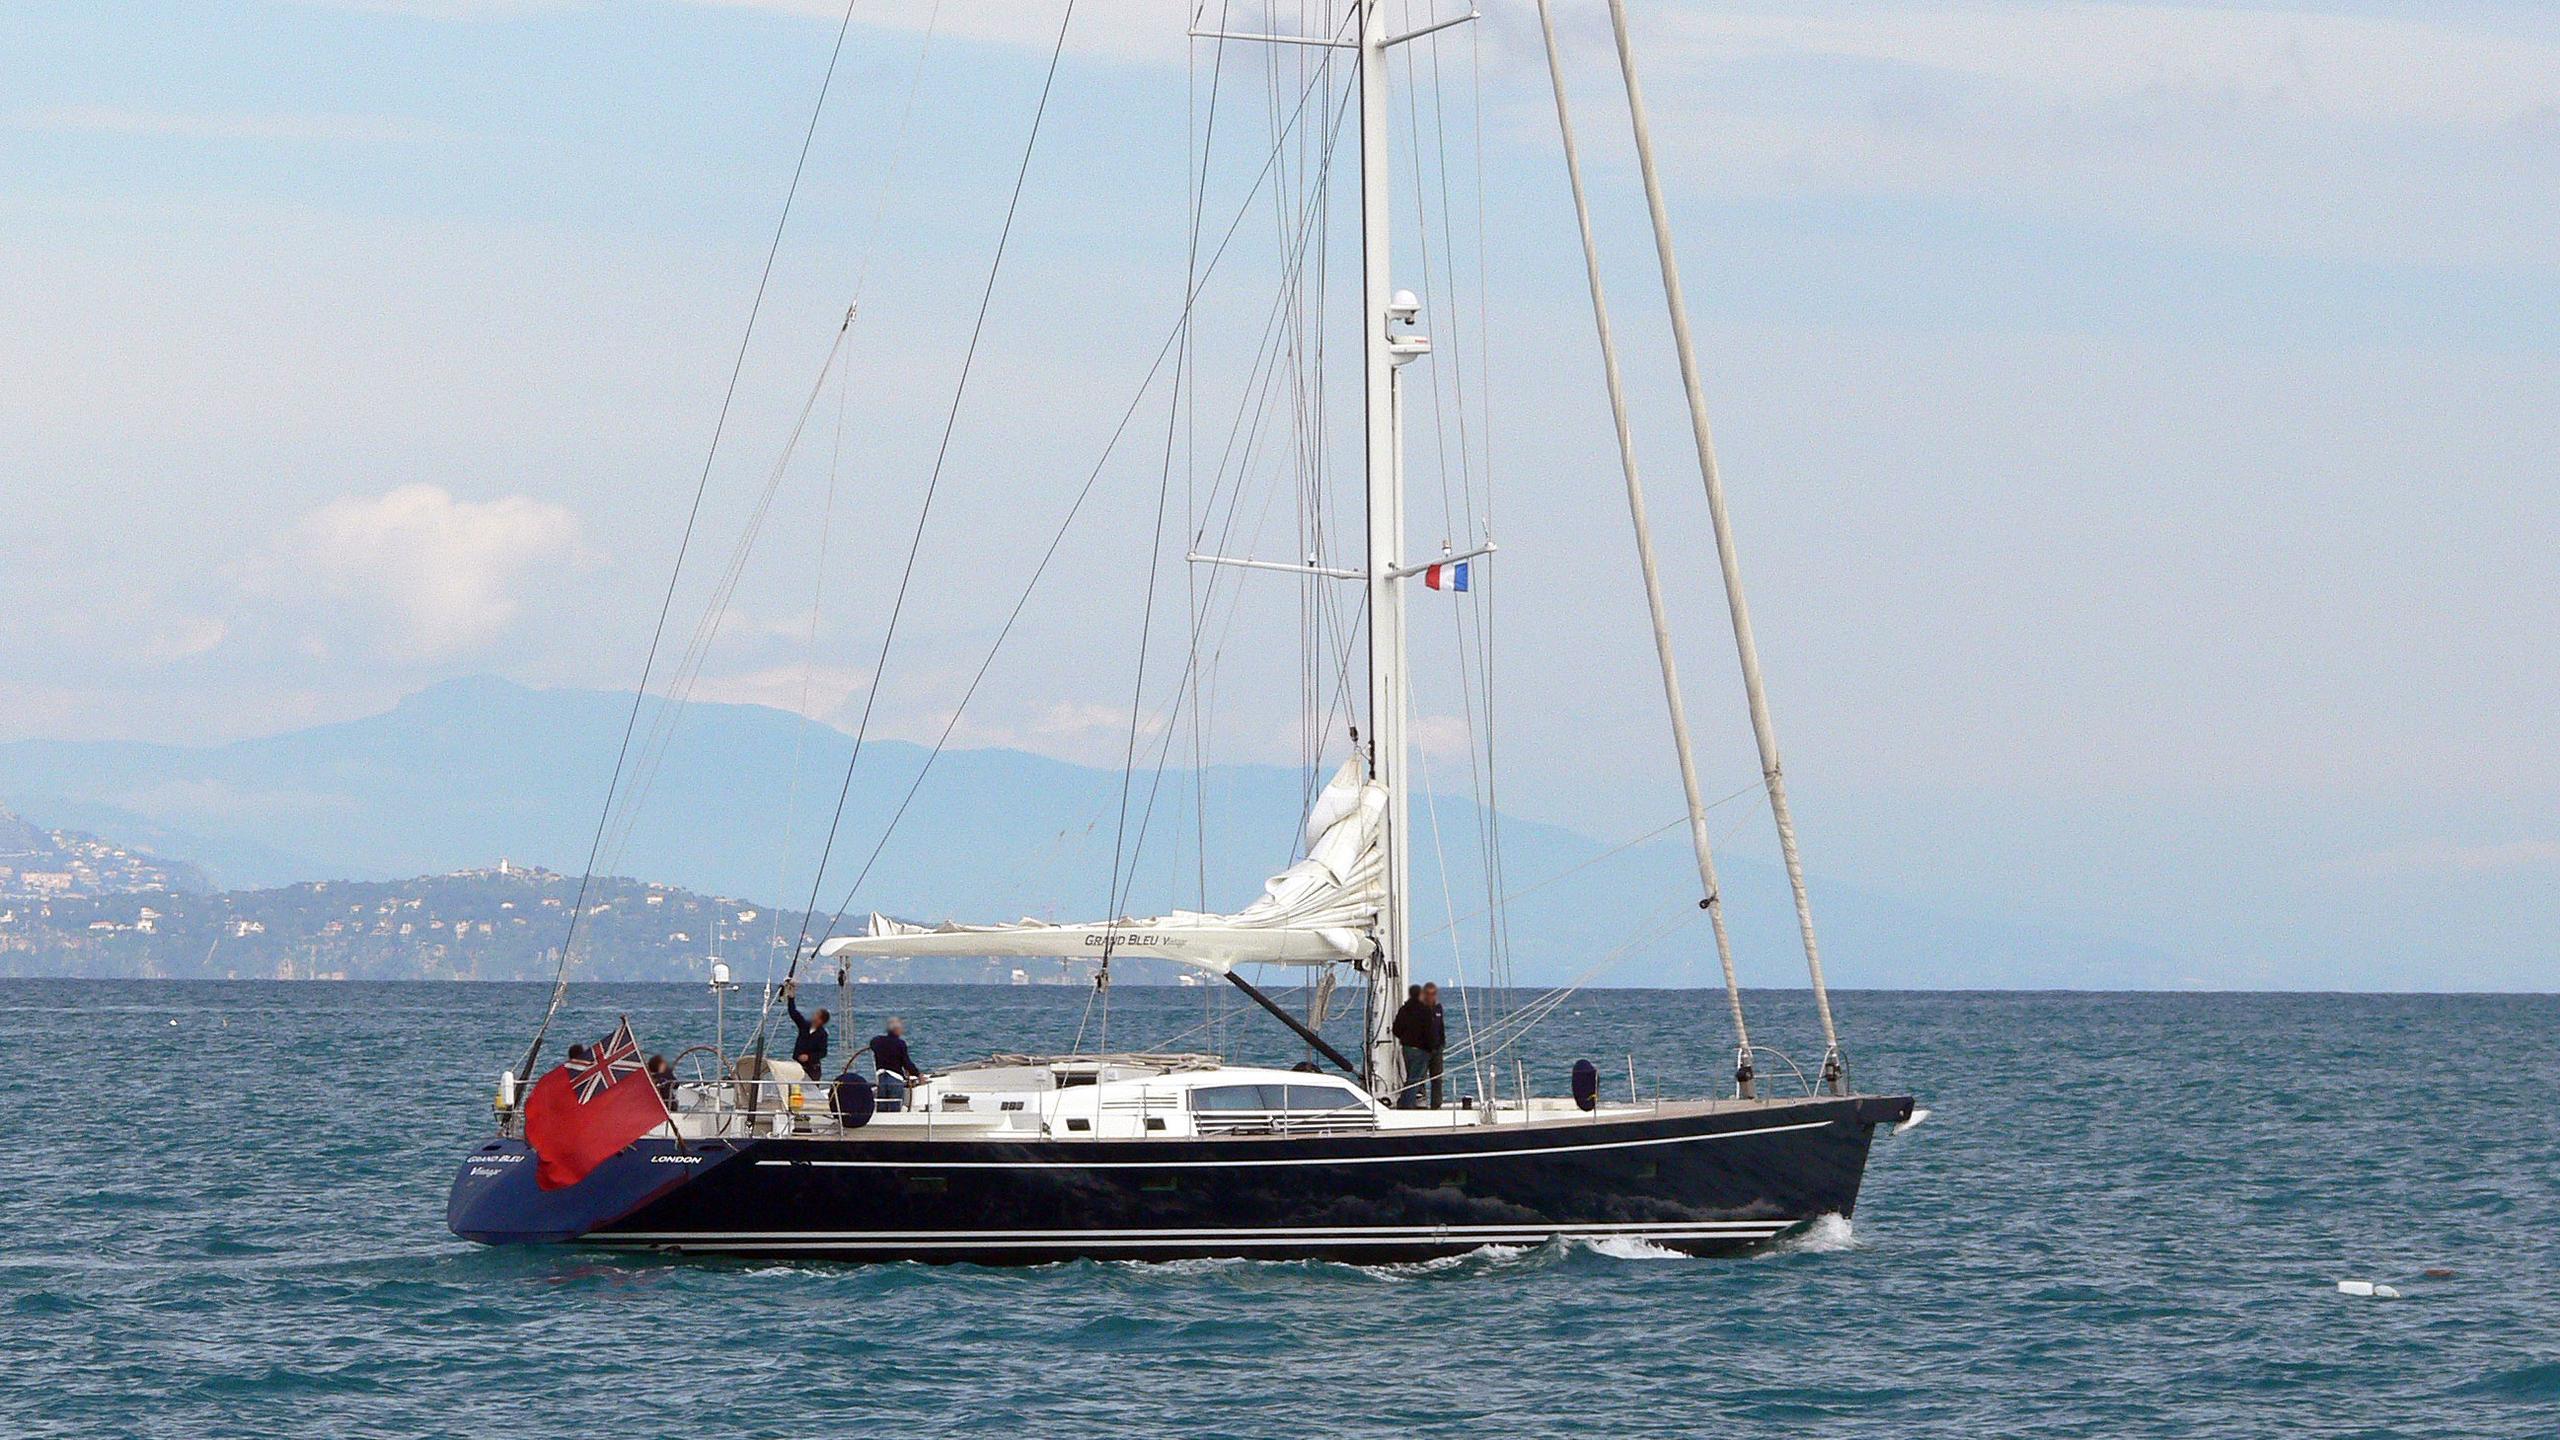 grand-bleu-sailing-yacht-vintage-cnb-2003-29m-running-half-profile